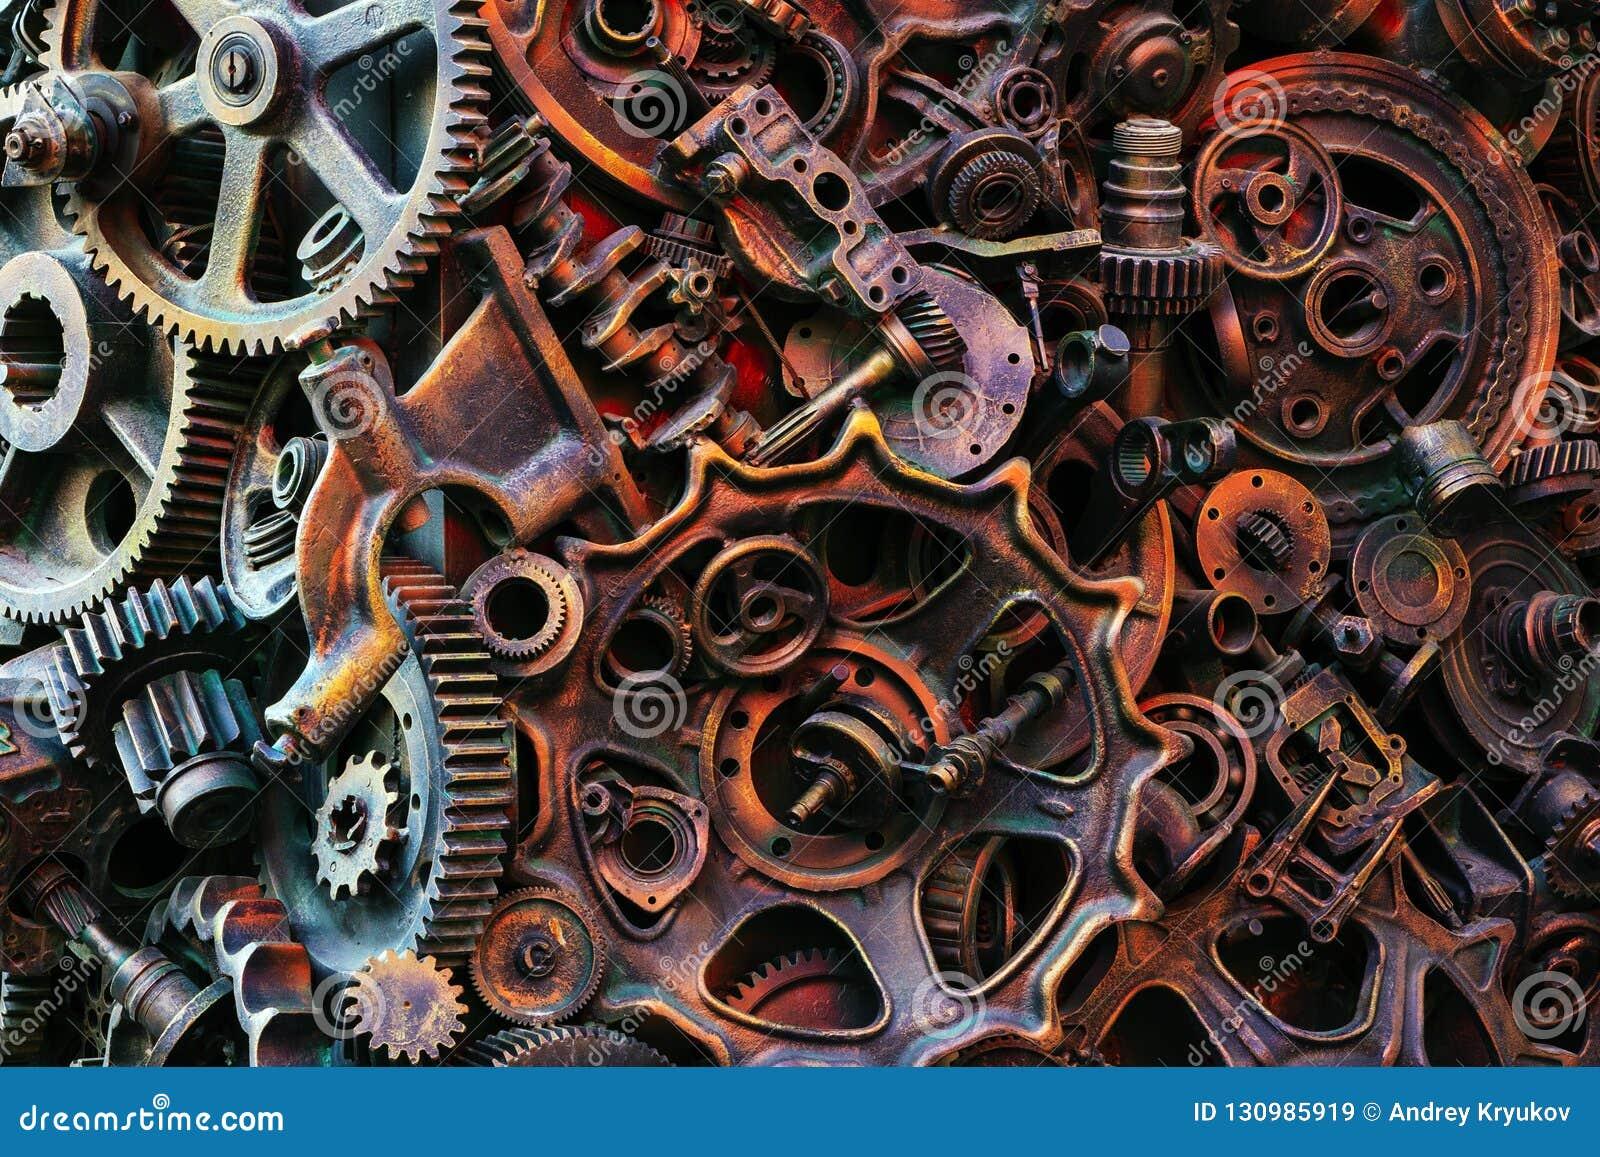 Steampunk背景、机器和机械部分、大齿轮和链子从机器和拖拉机